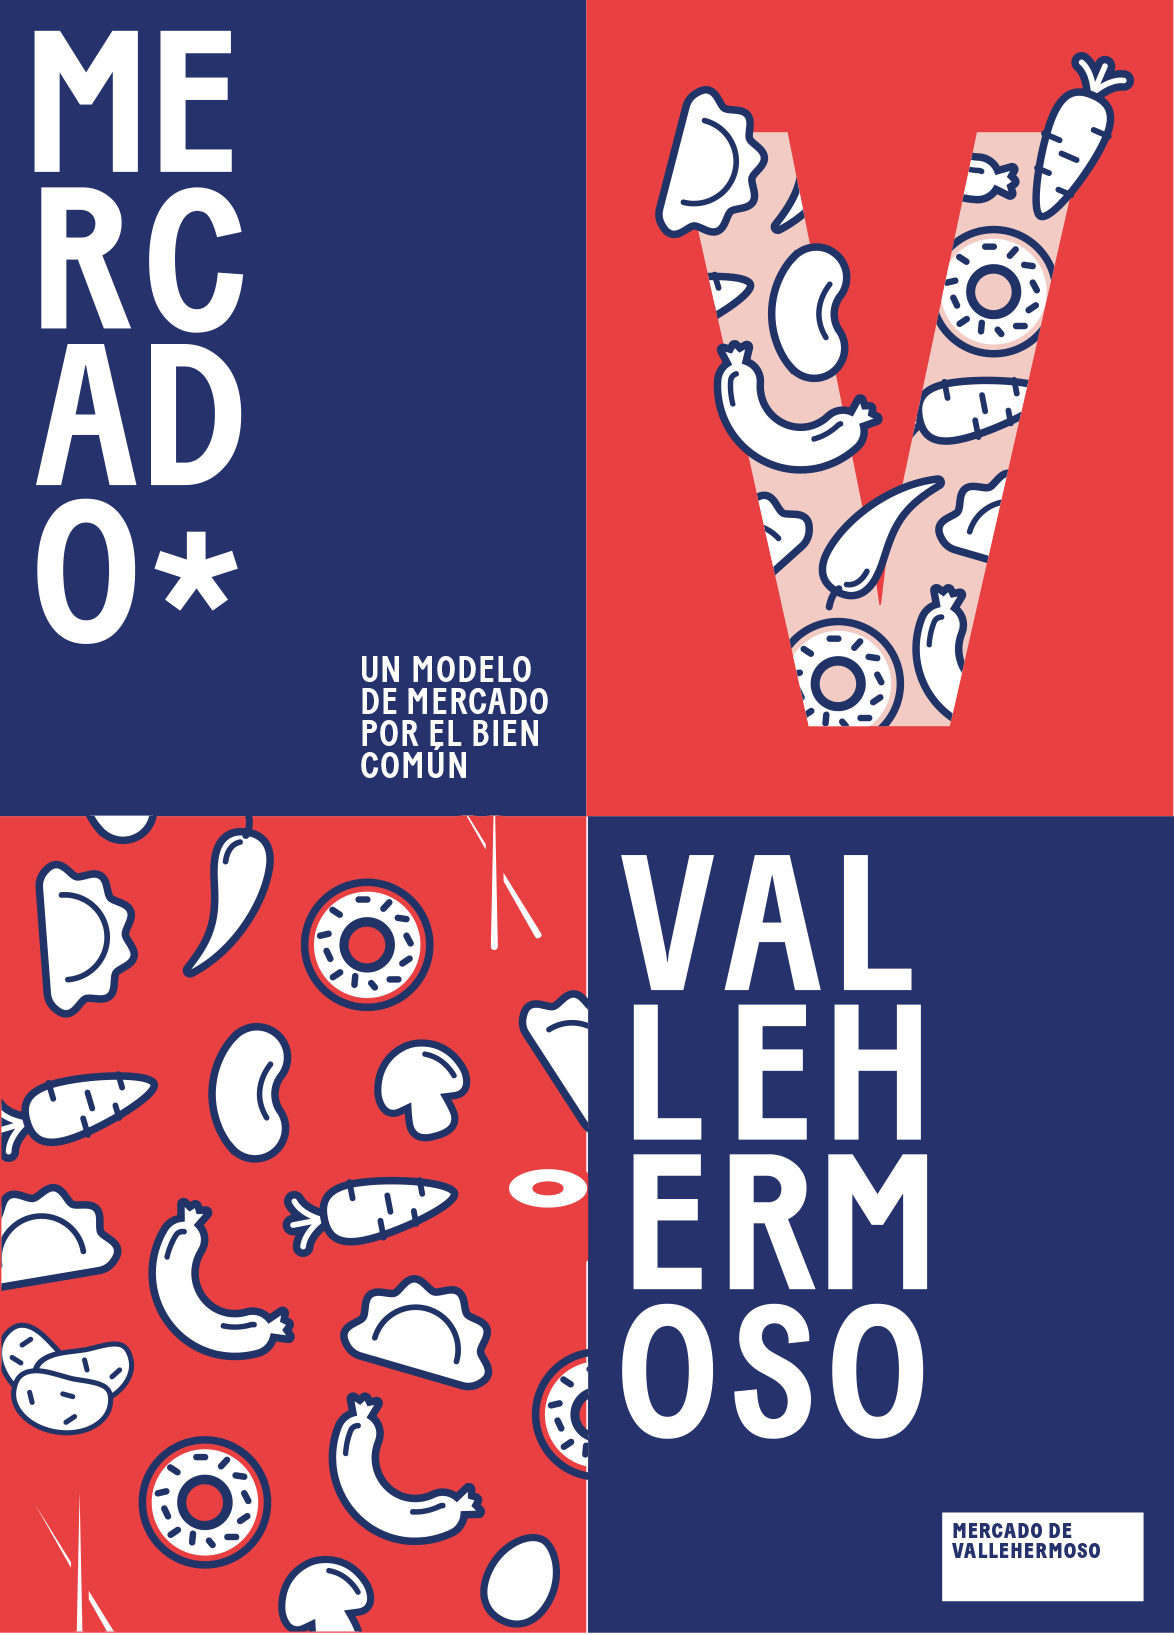 Mercado-vallehermoso-espinosa-10-c